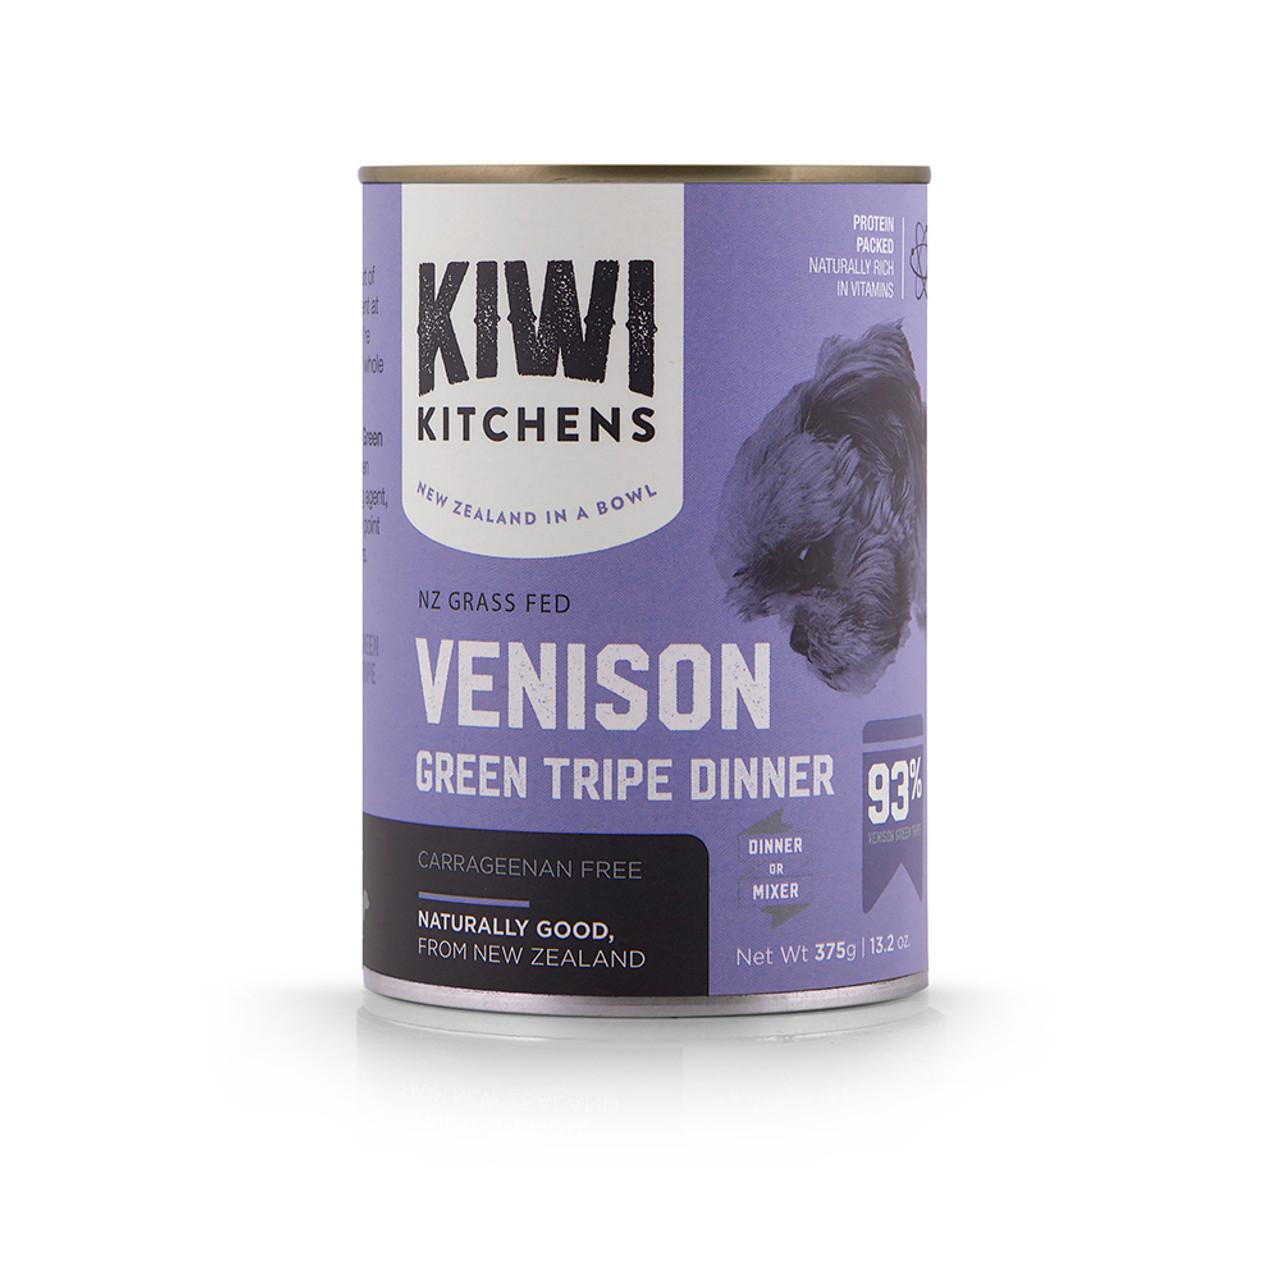 Kiwi Kitchens Grass Fed Venison Green Tripe Dinner Canned Dog Food